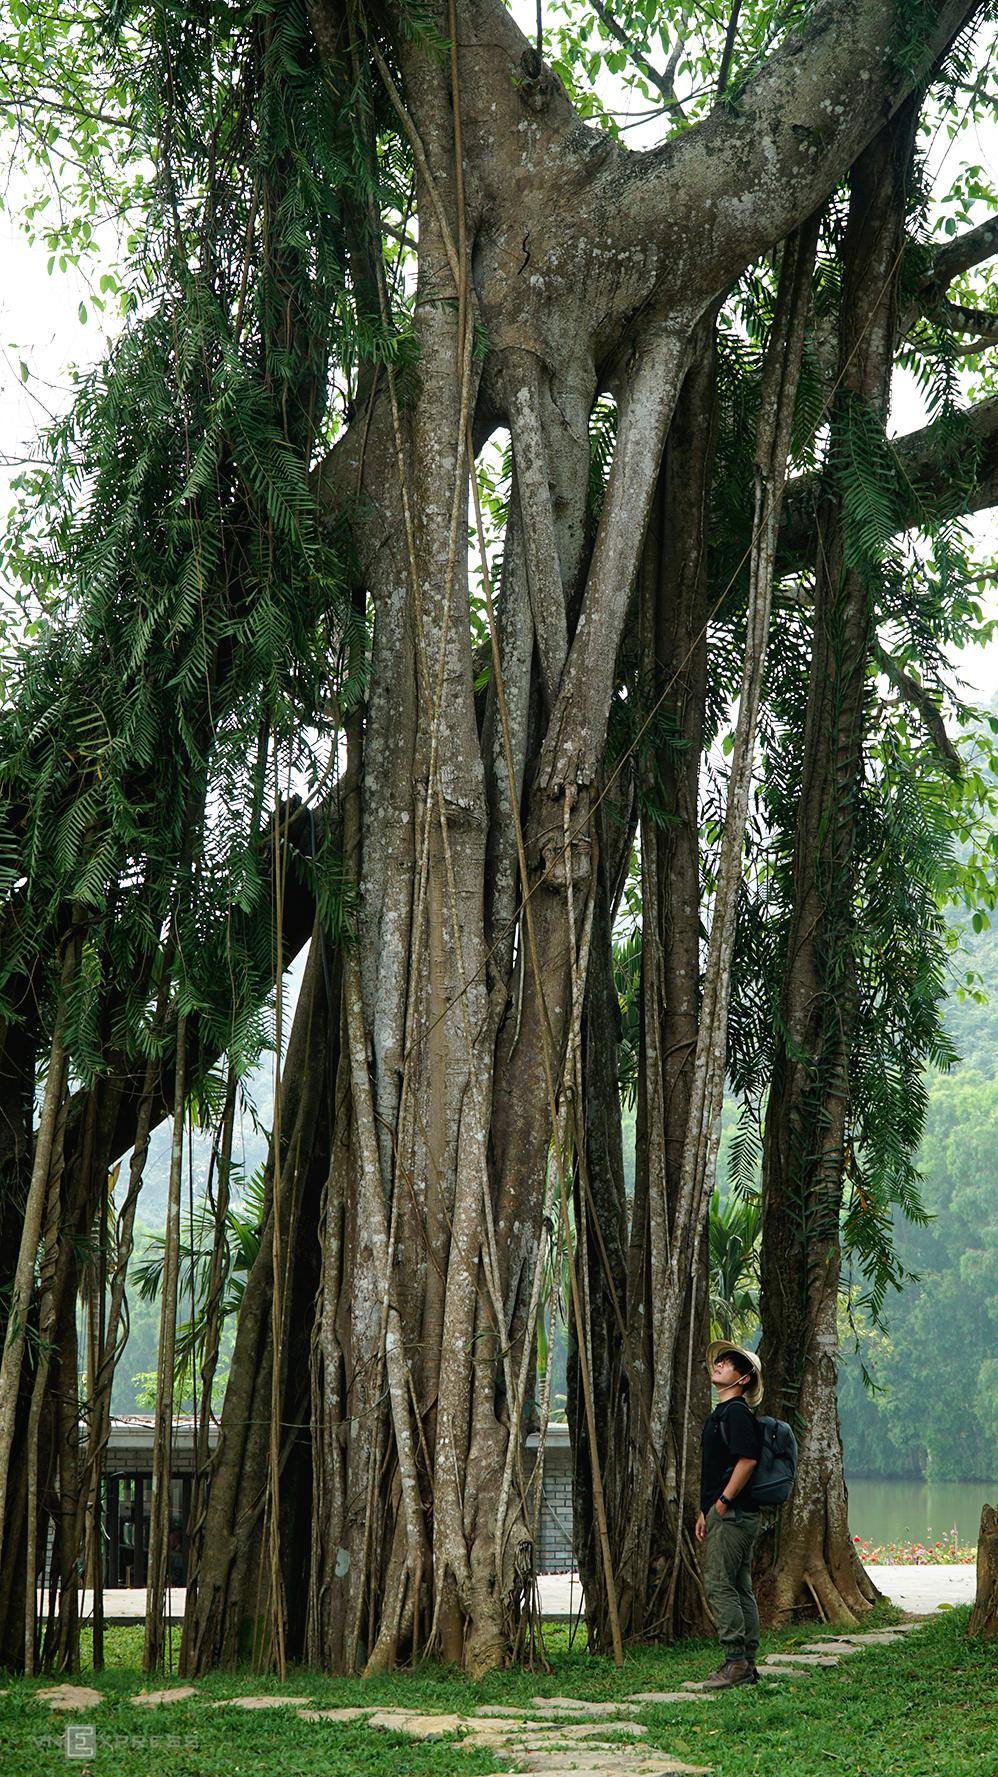 5 giant trees attract tourists across Vietnam